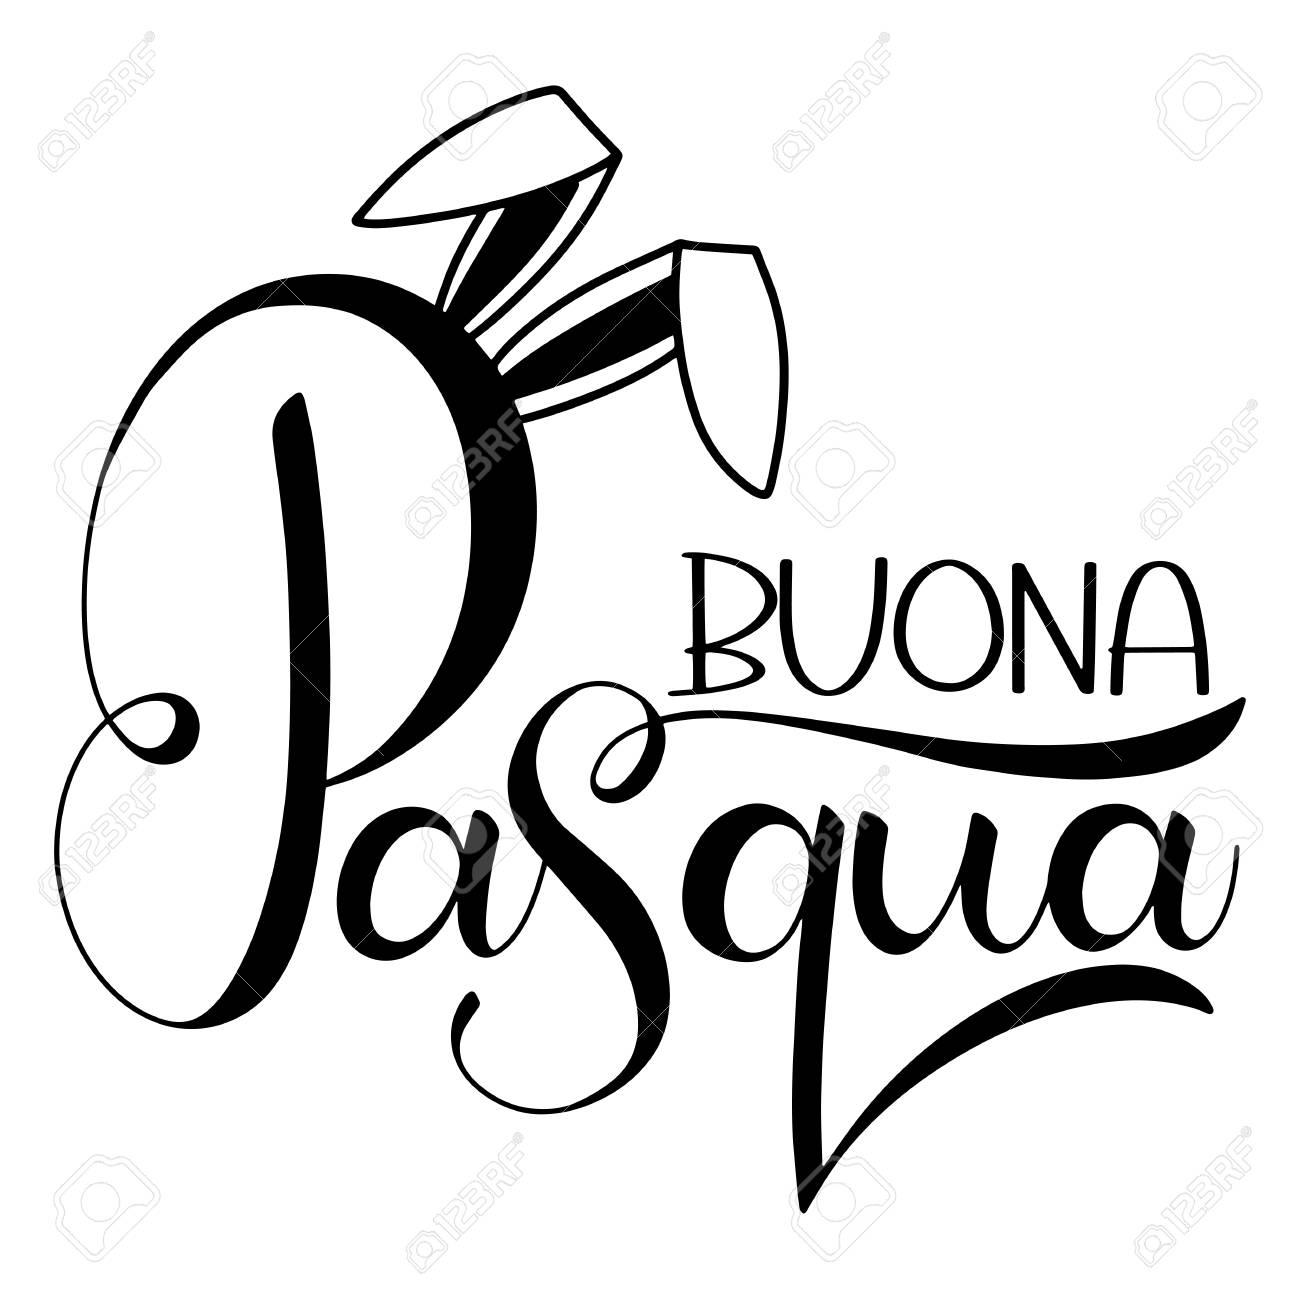 Buona Pasqua Lettering Happy Easter Colorful Lettering In Italian